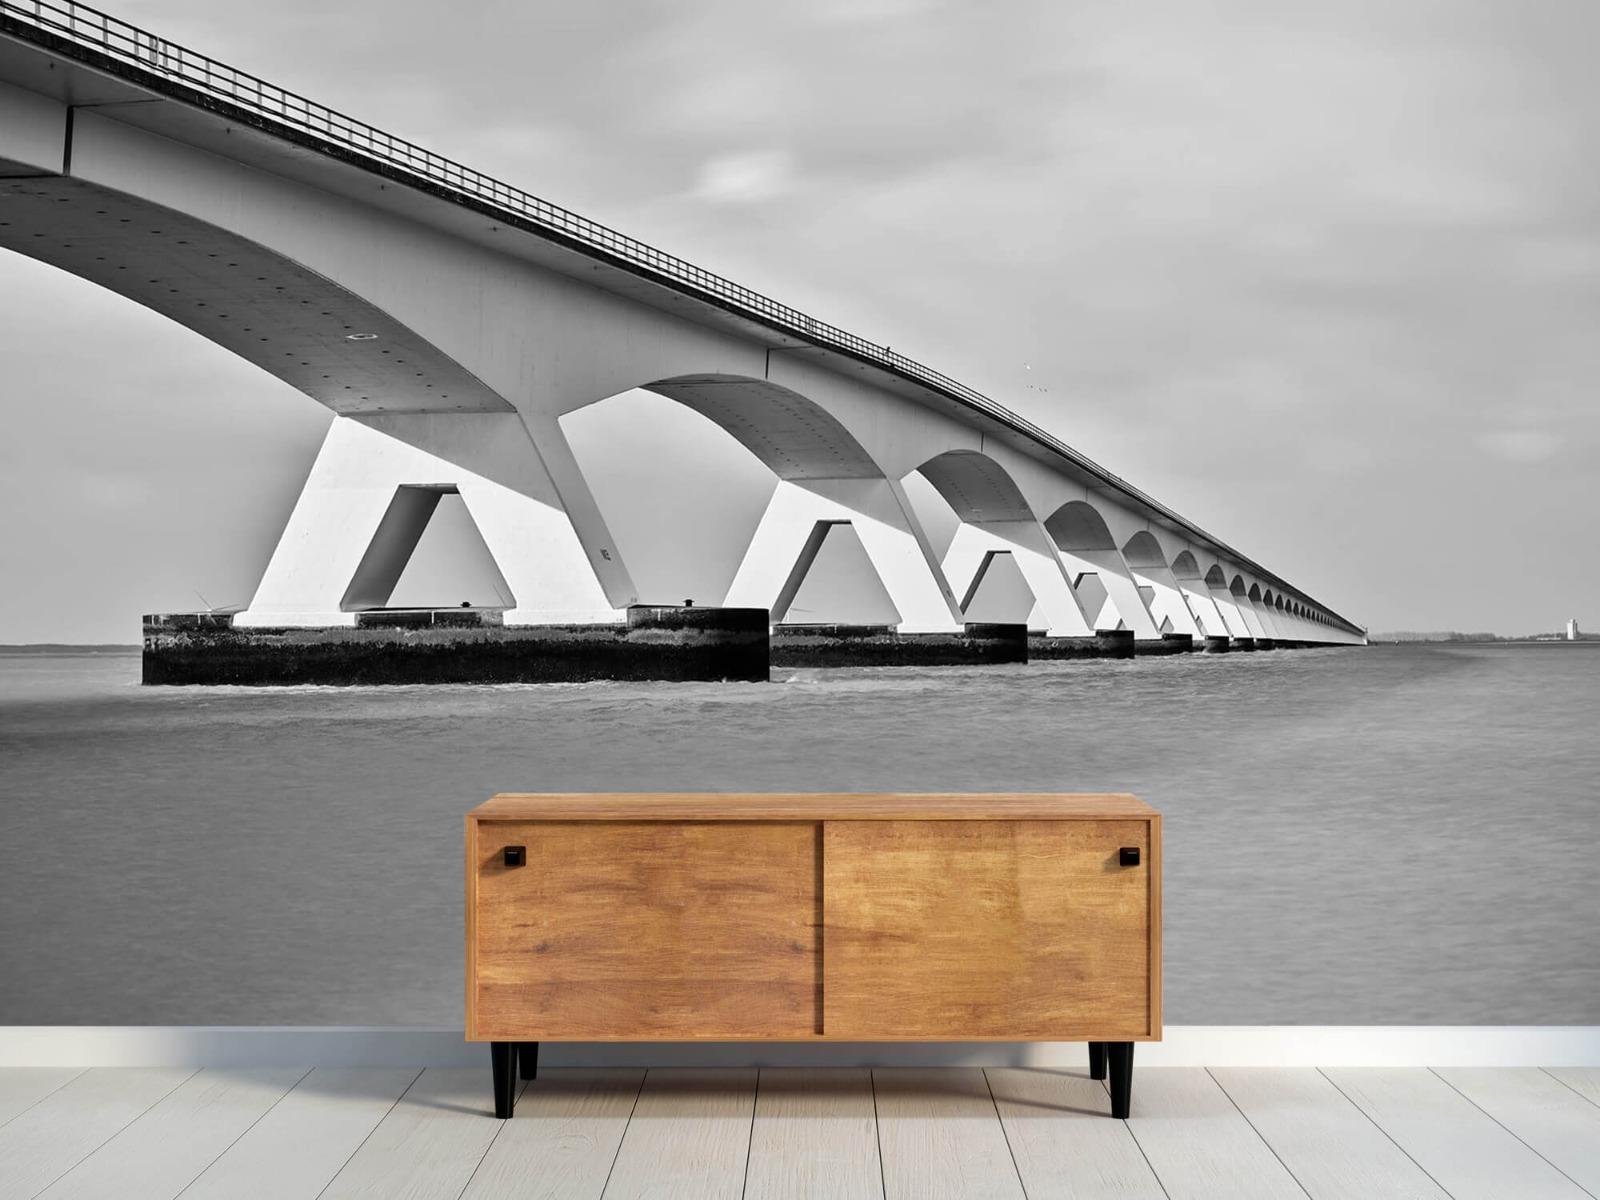 Zwart Wit behang - Lange brug - Kantoor 10